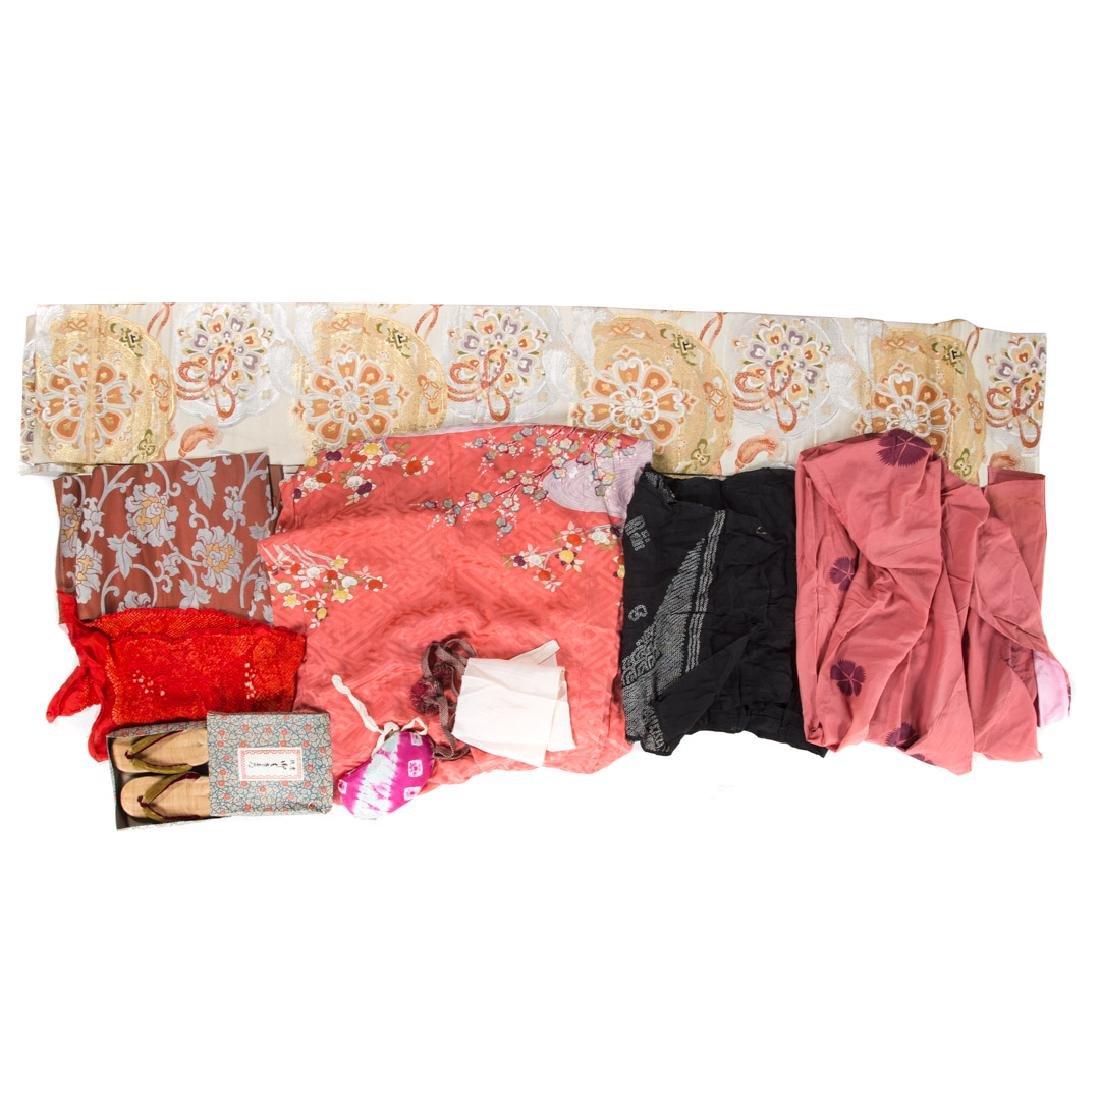 Japanese silk kimono, sashes, and accessories